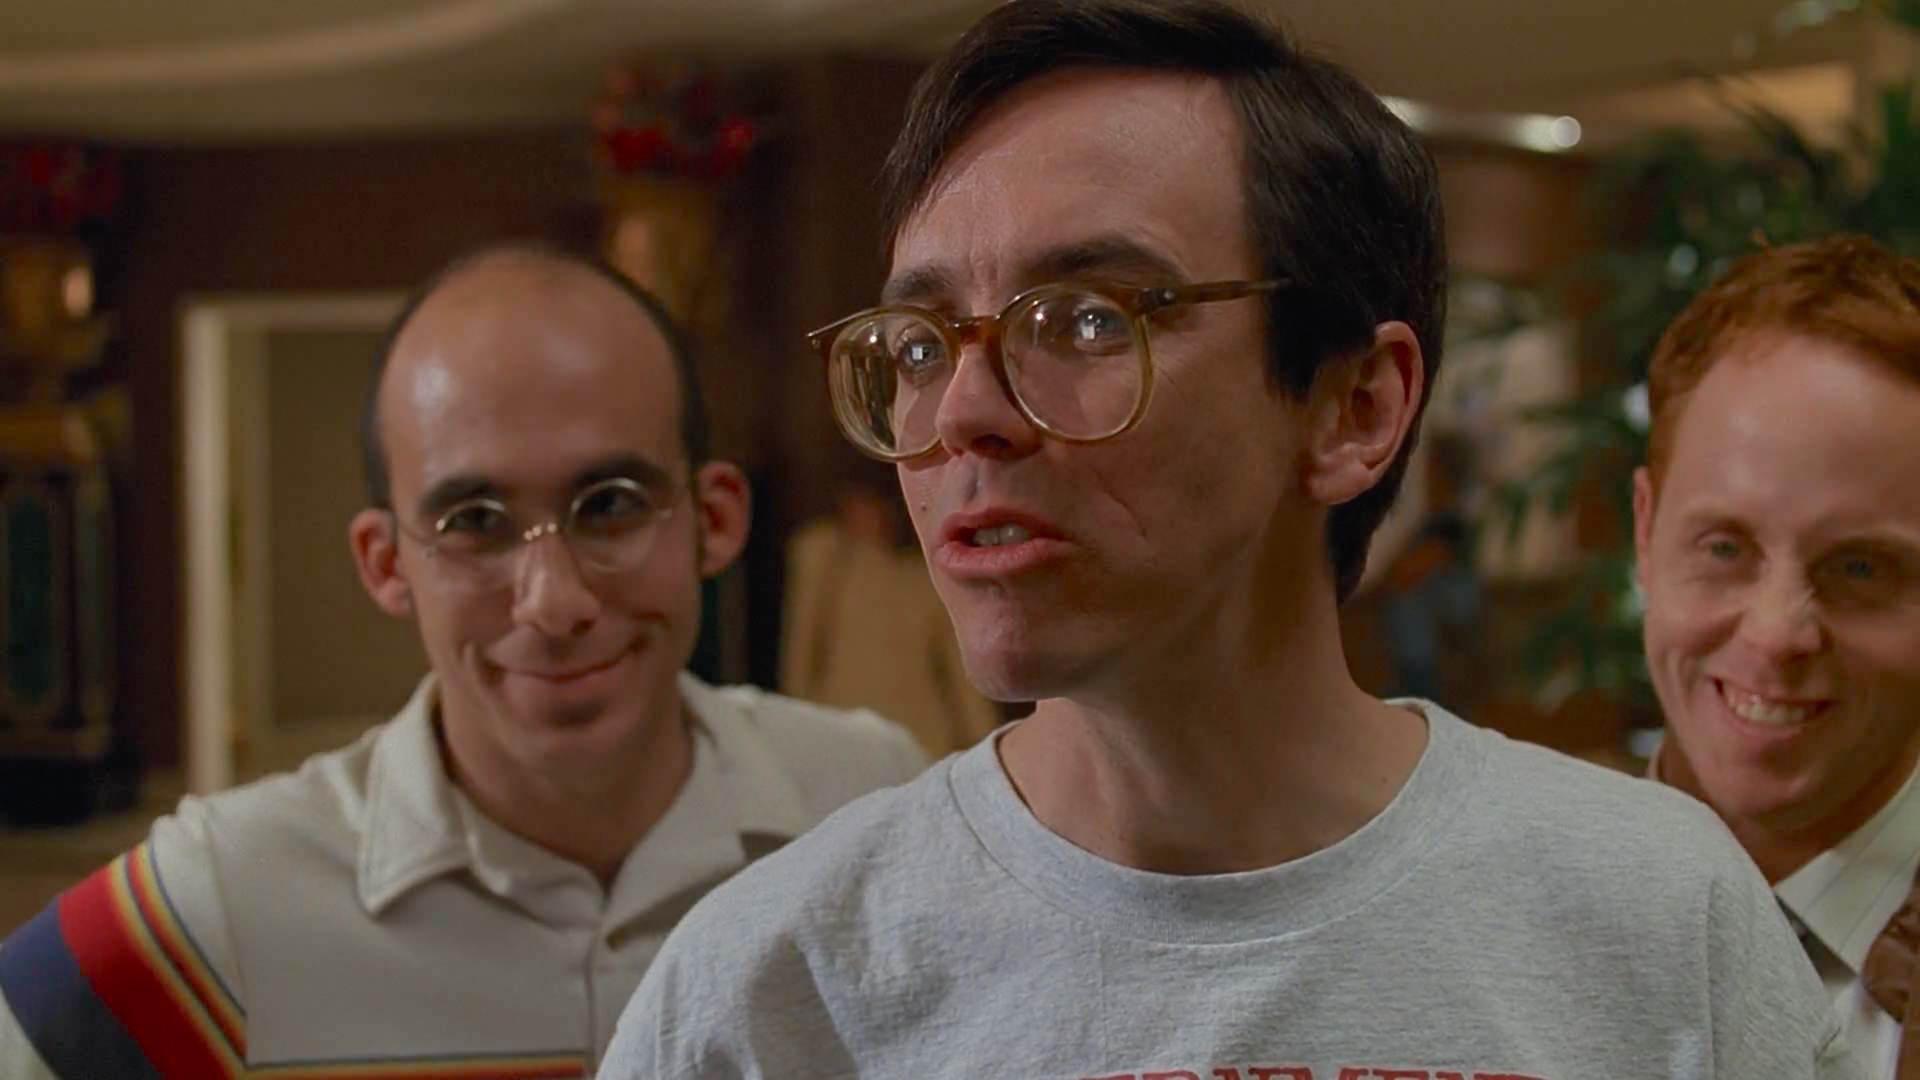 Jeff Bowser, Jim Fyfe, and Jason Felipe in The X Files (1993)